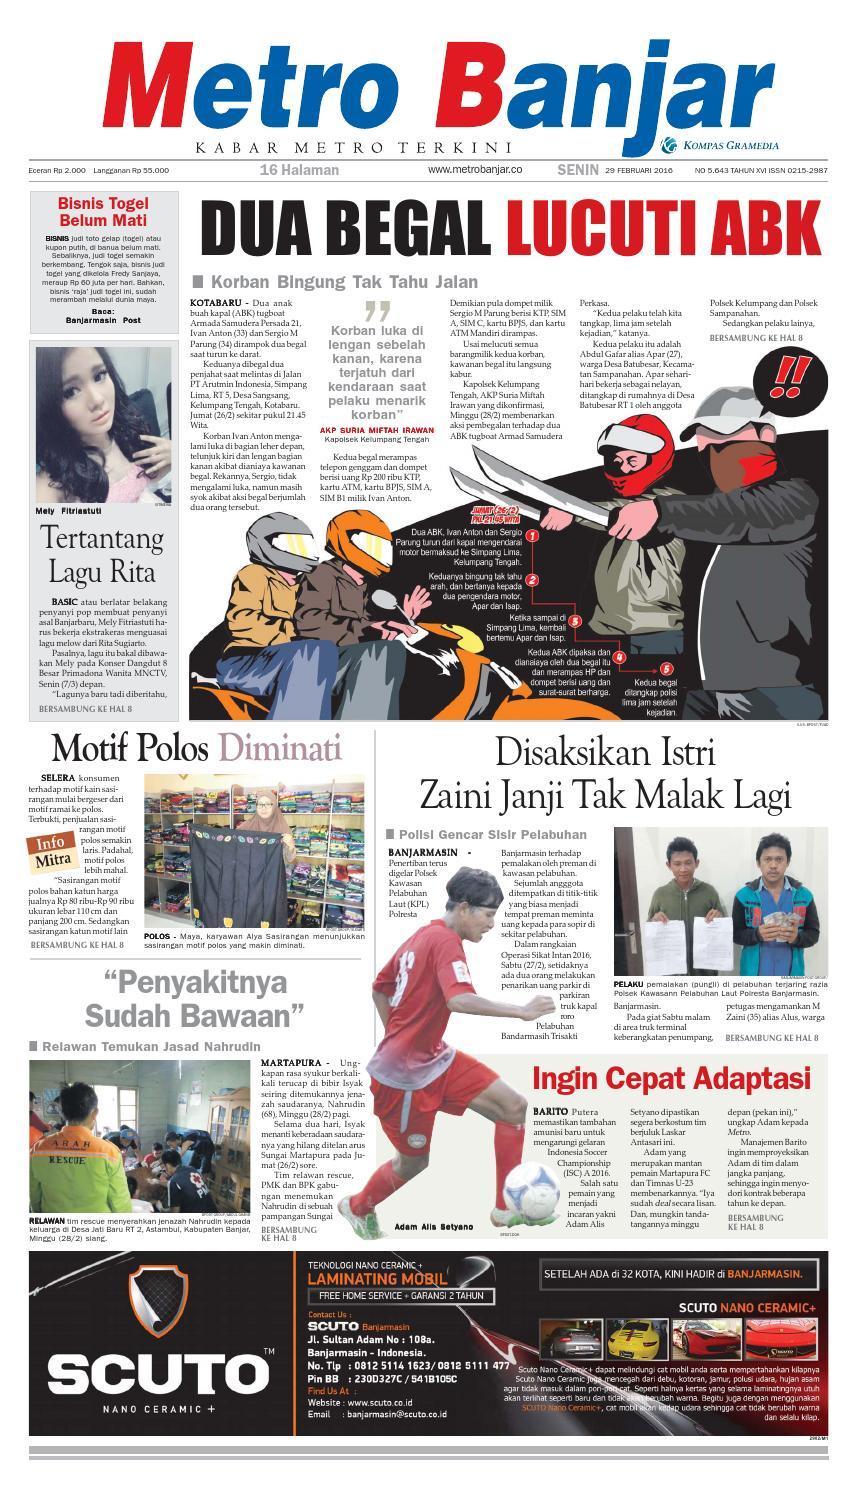 Metro Banjar Senin 29 Februari 2016 by Harian Metro Banjar - issuu